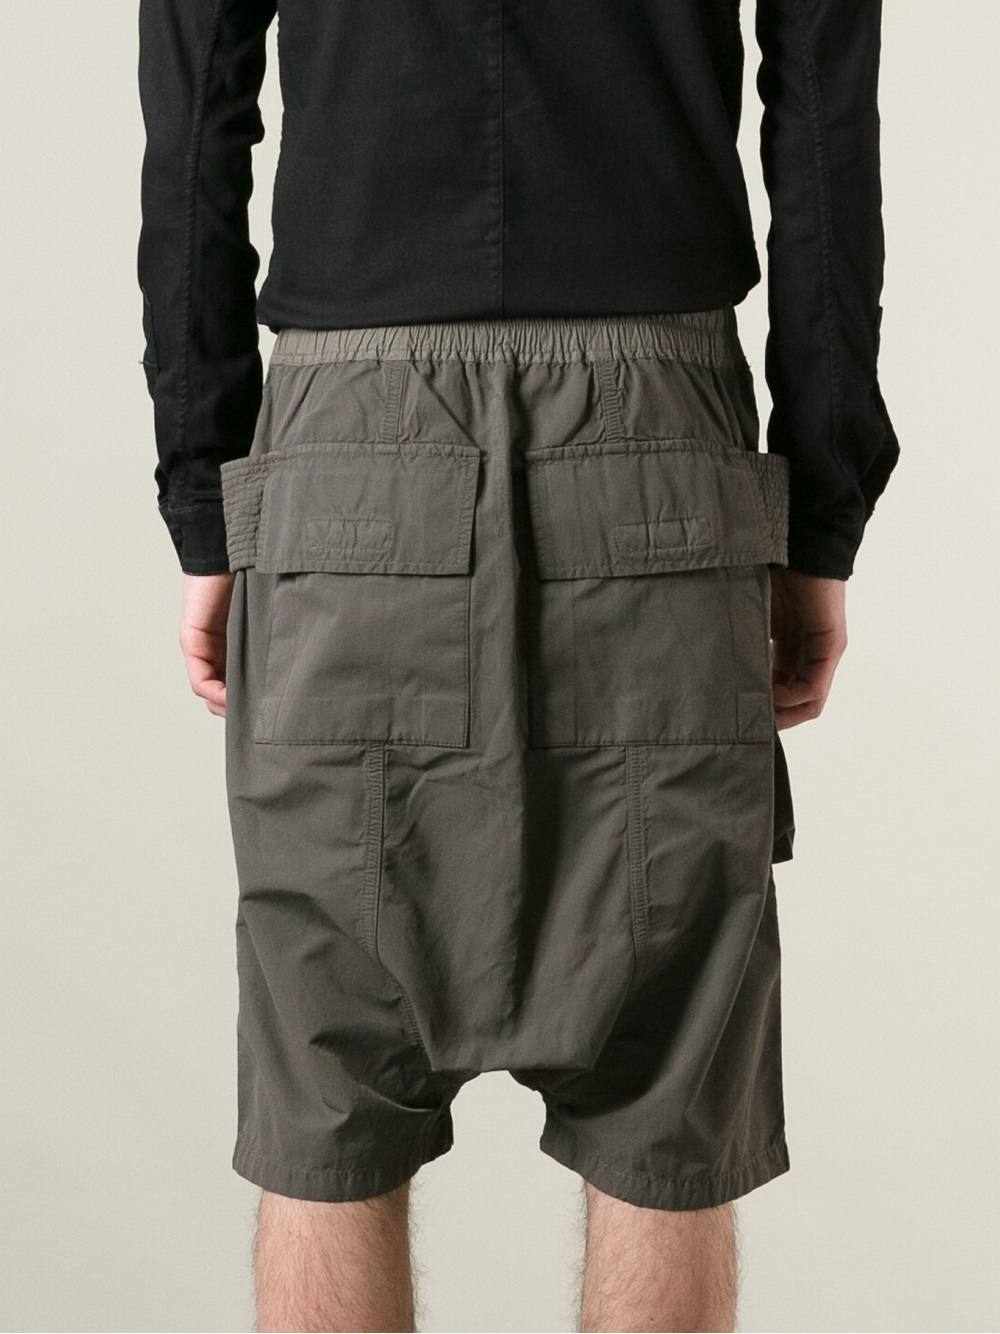 Pod cargo shorts - Grey Rick Owens JRxRj9wz5